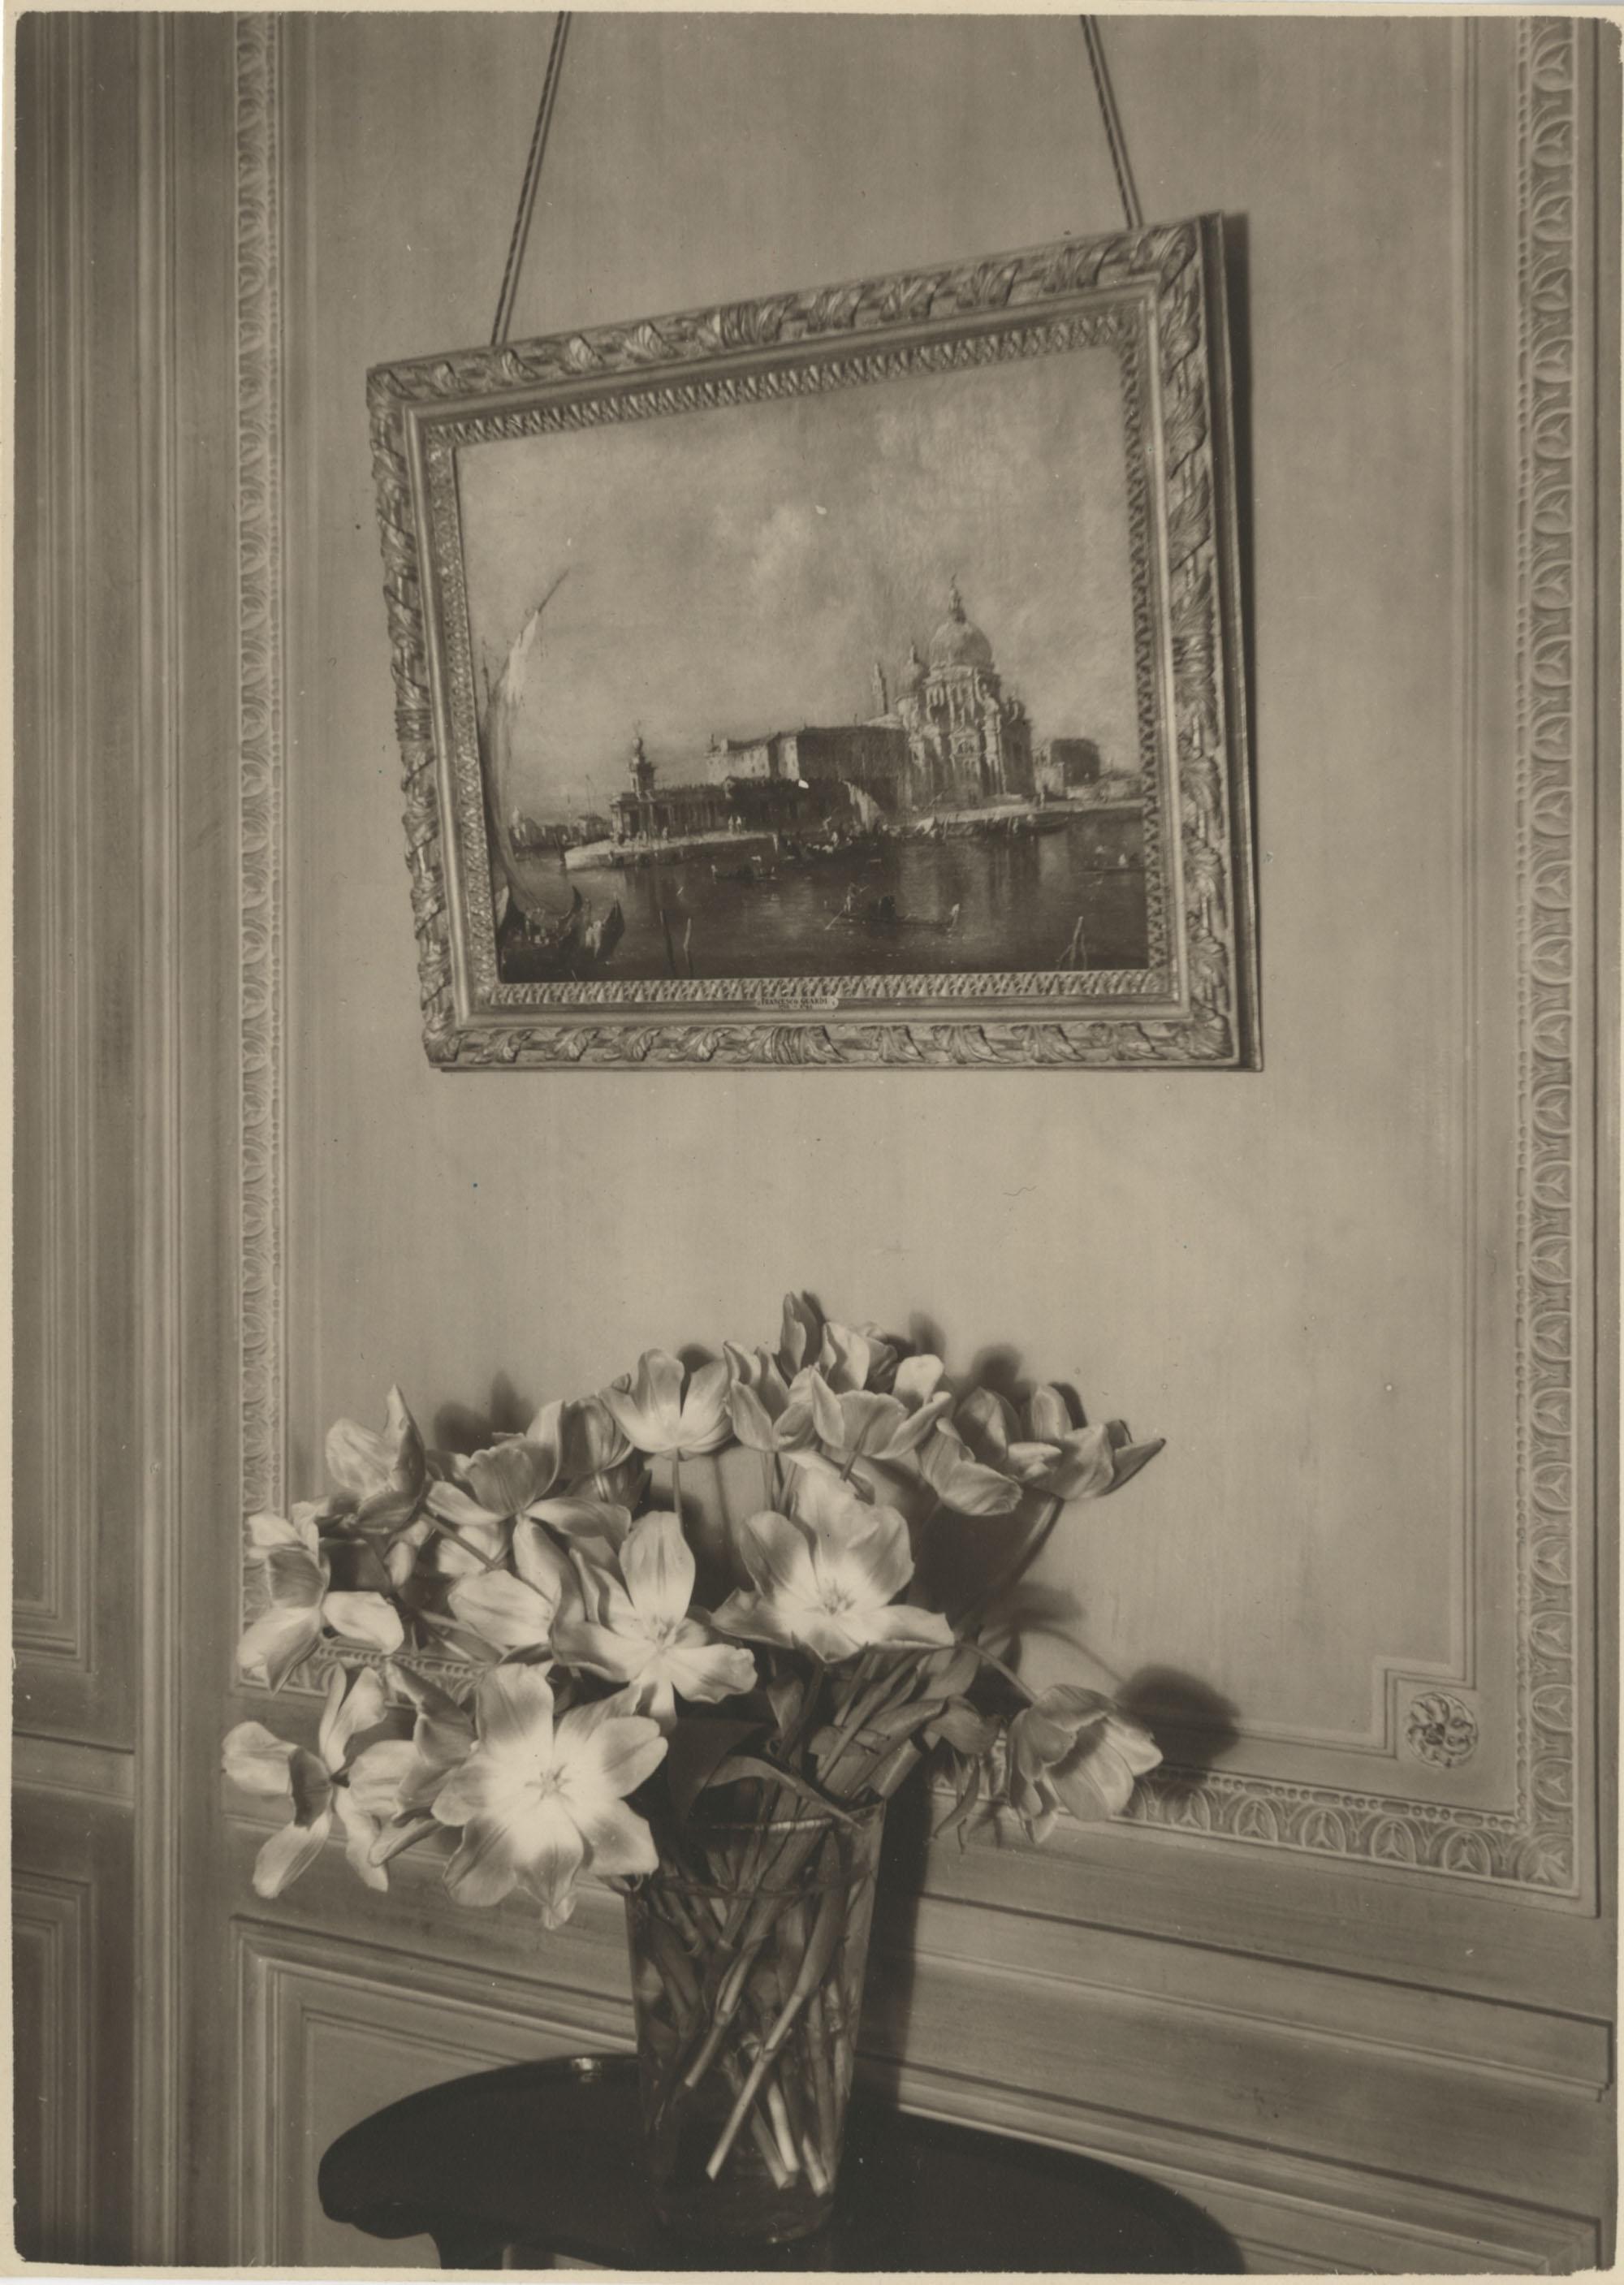 Interior of the Royal Italian Consul in Sri Lanka, Photograph 14